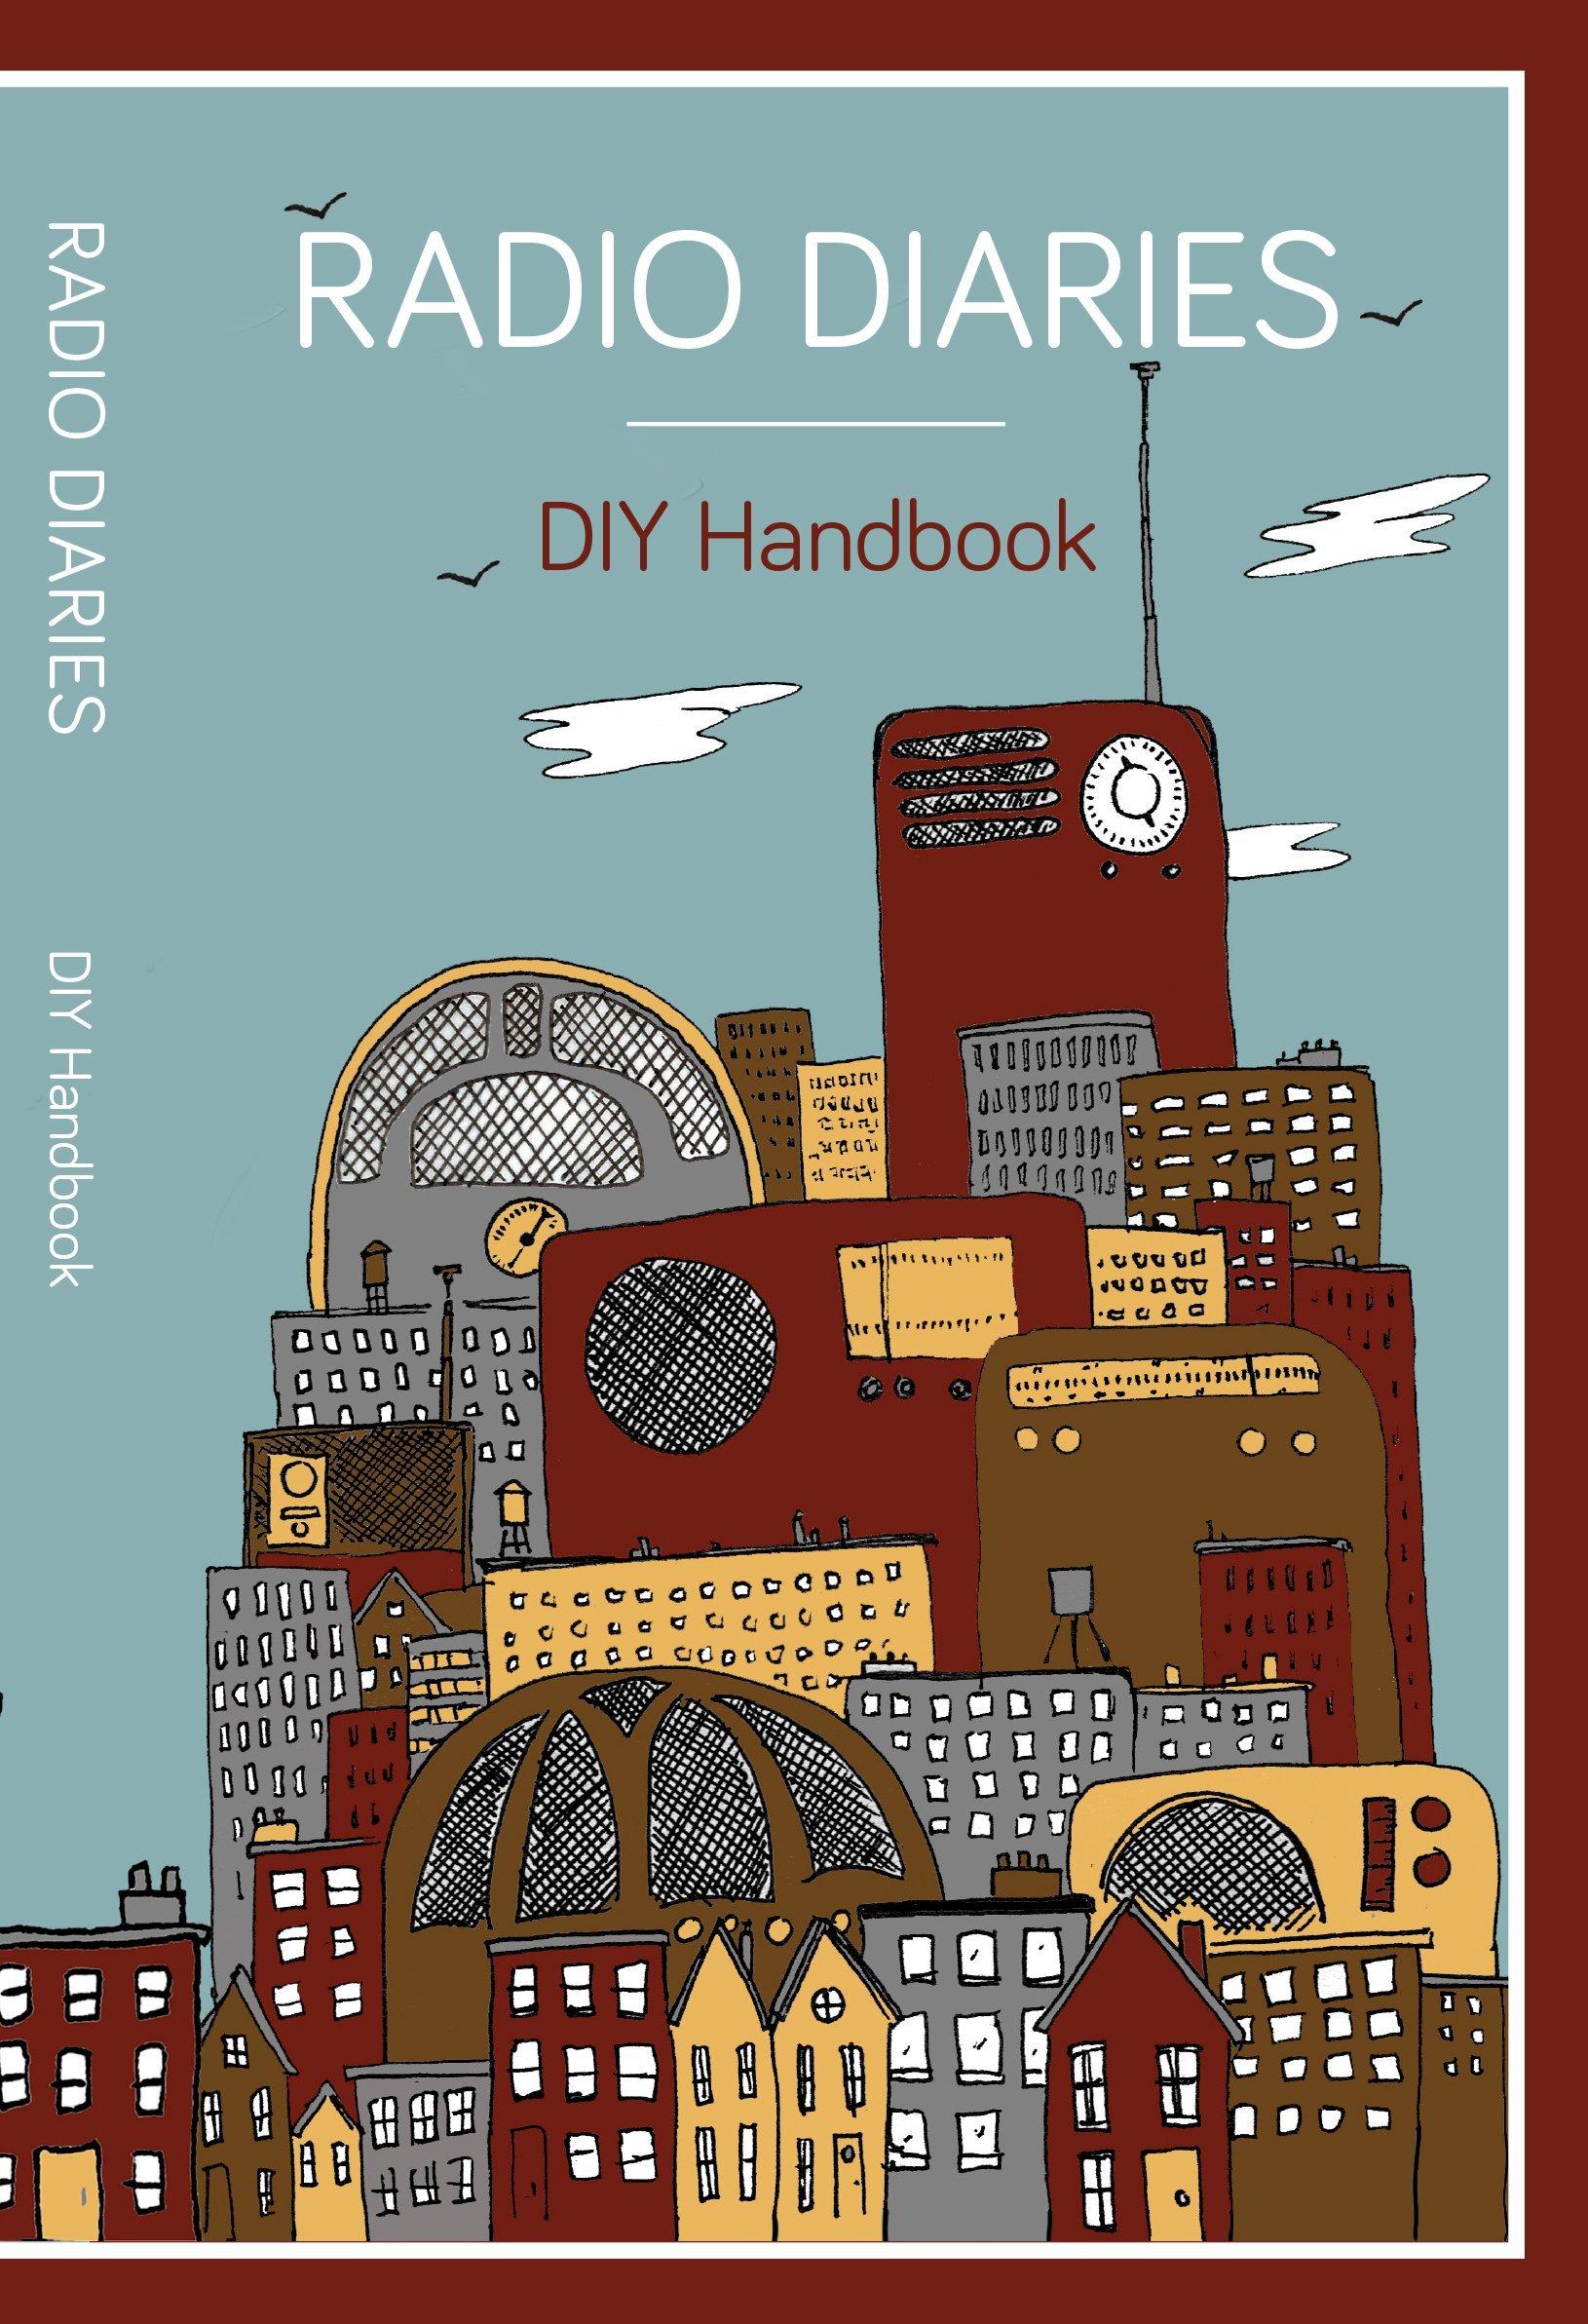 Radio Diaries: DIY Handbook